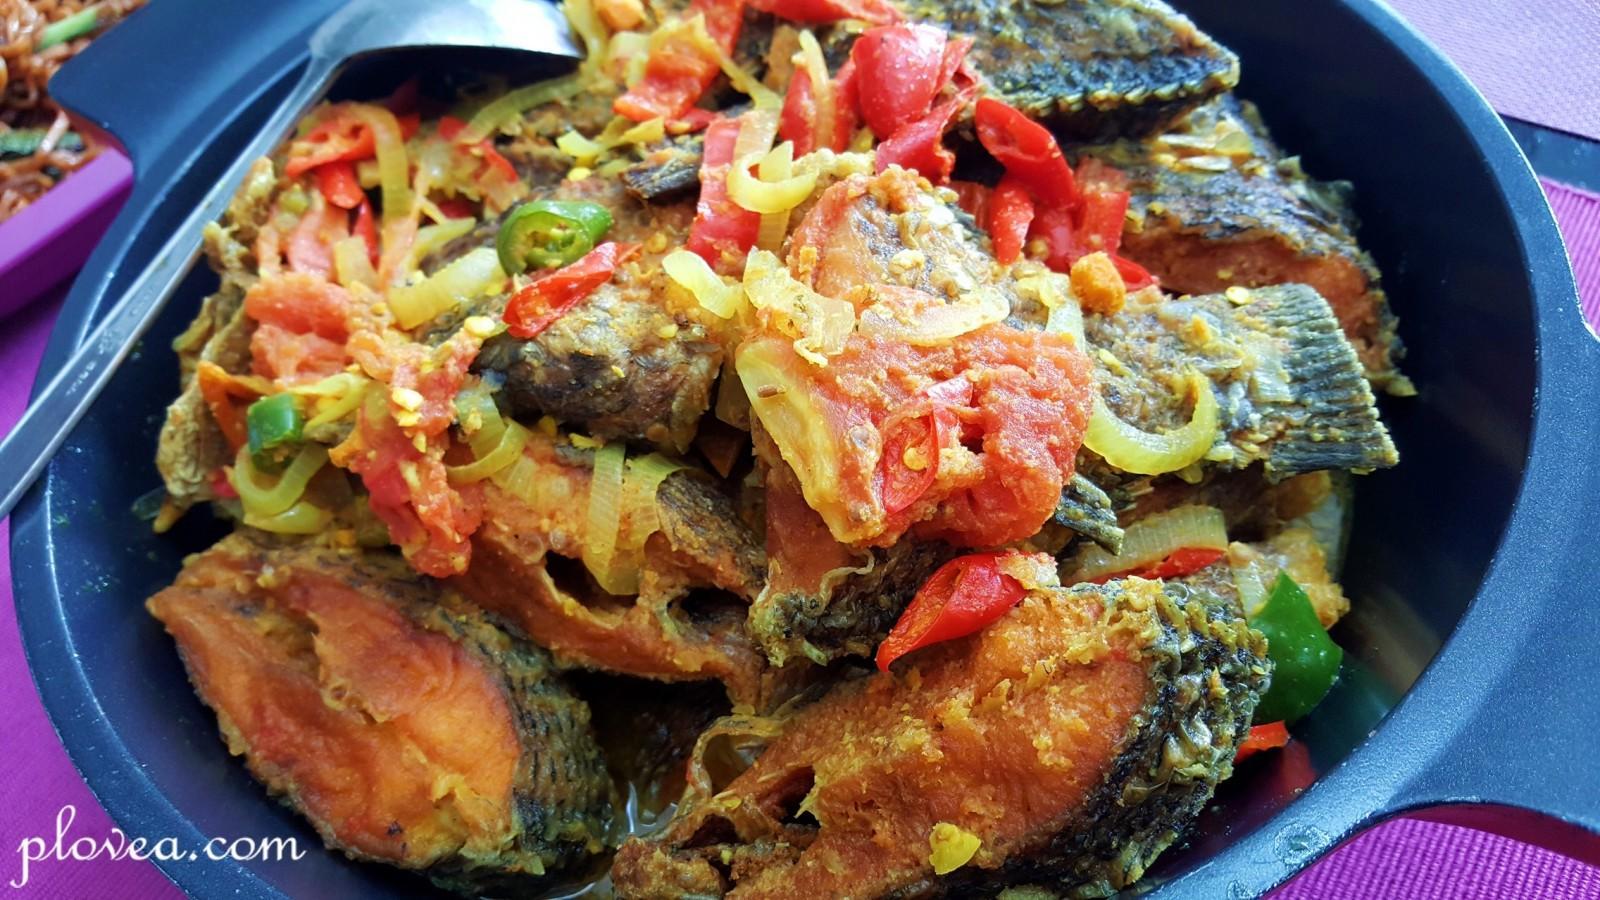 Masak Apa Hari Ini Mengatur Menu Masakan Untuk Seminggu When Samosir Meets Krones